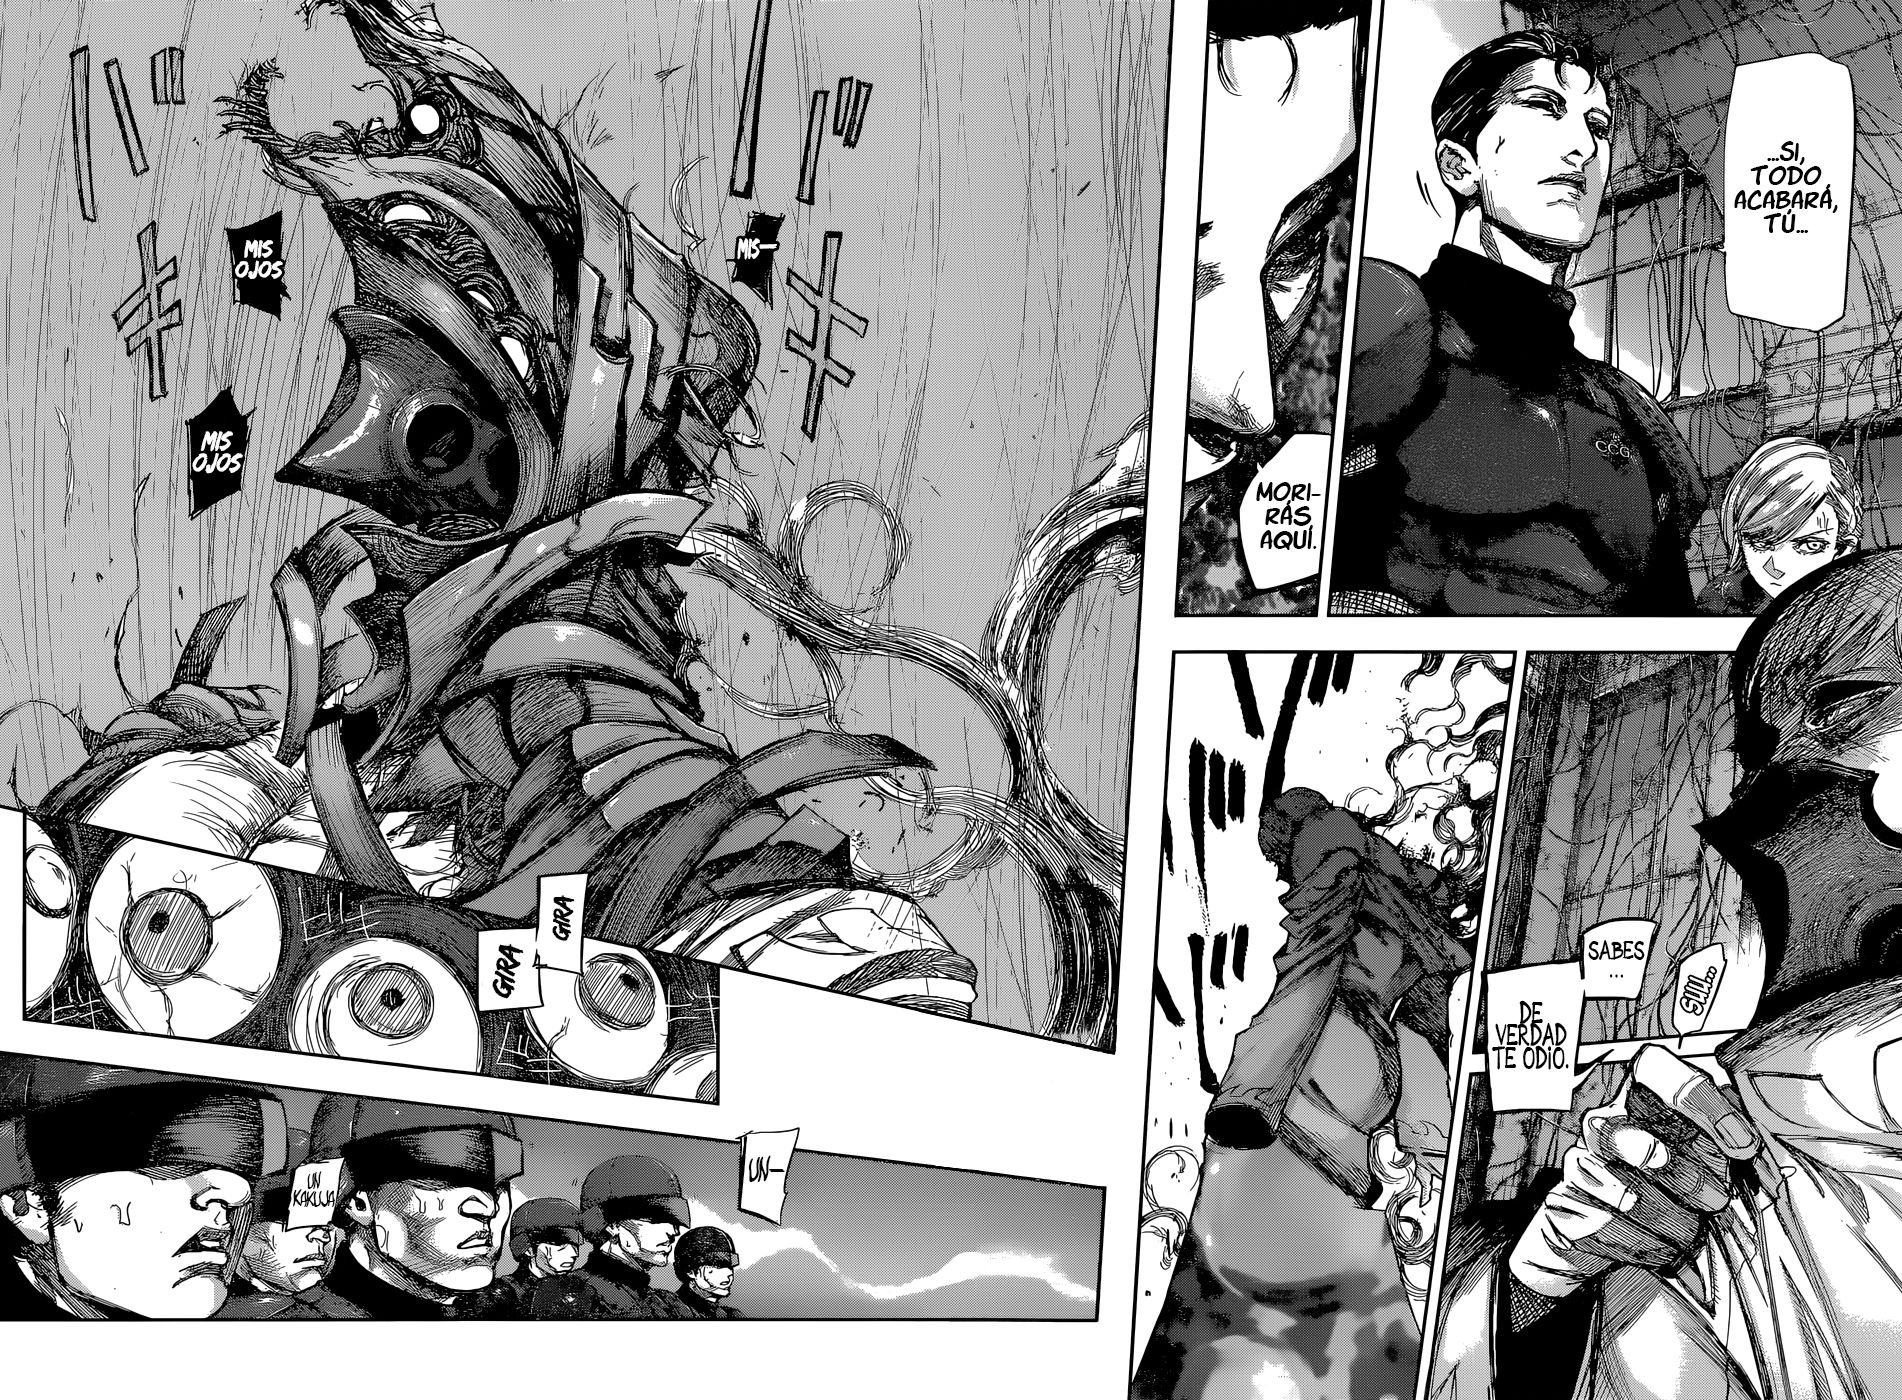 http://c5.ninemanga.com/es_manga/59/59/488038/2ab0d800860461475f59d866202dc6d9.jpg Page 3